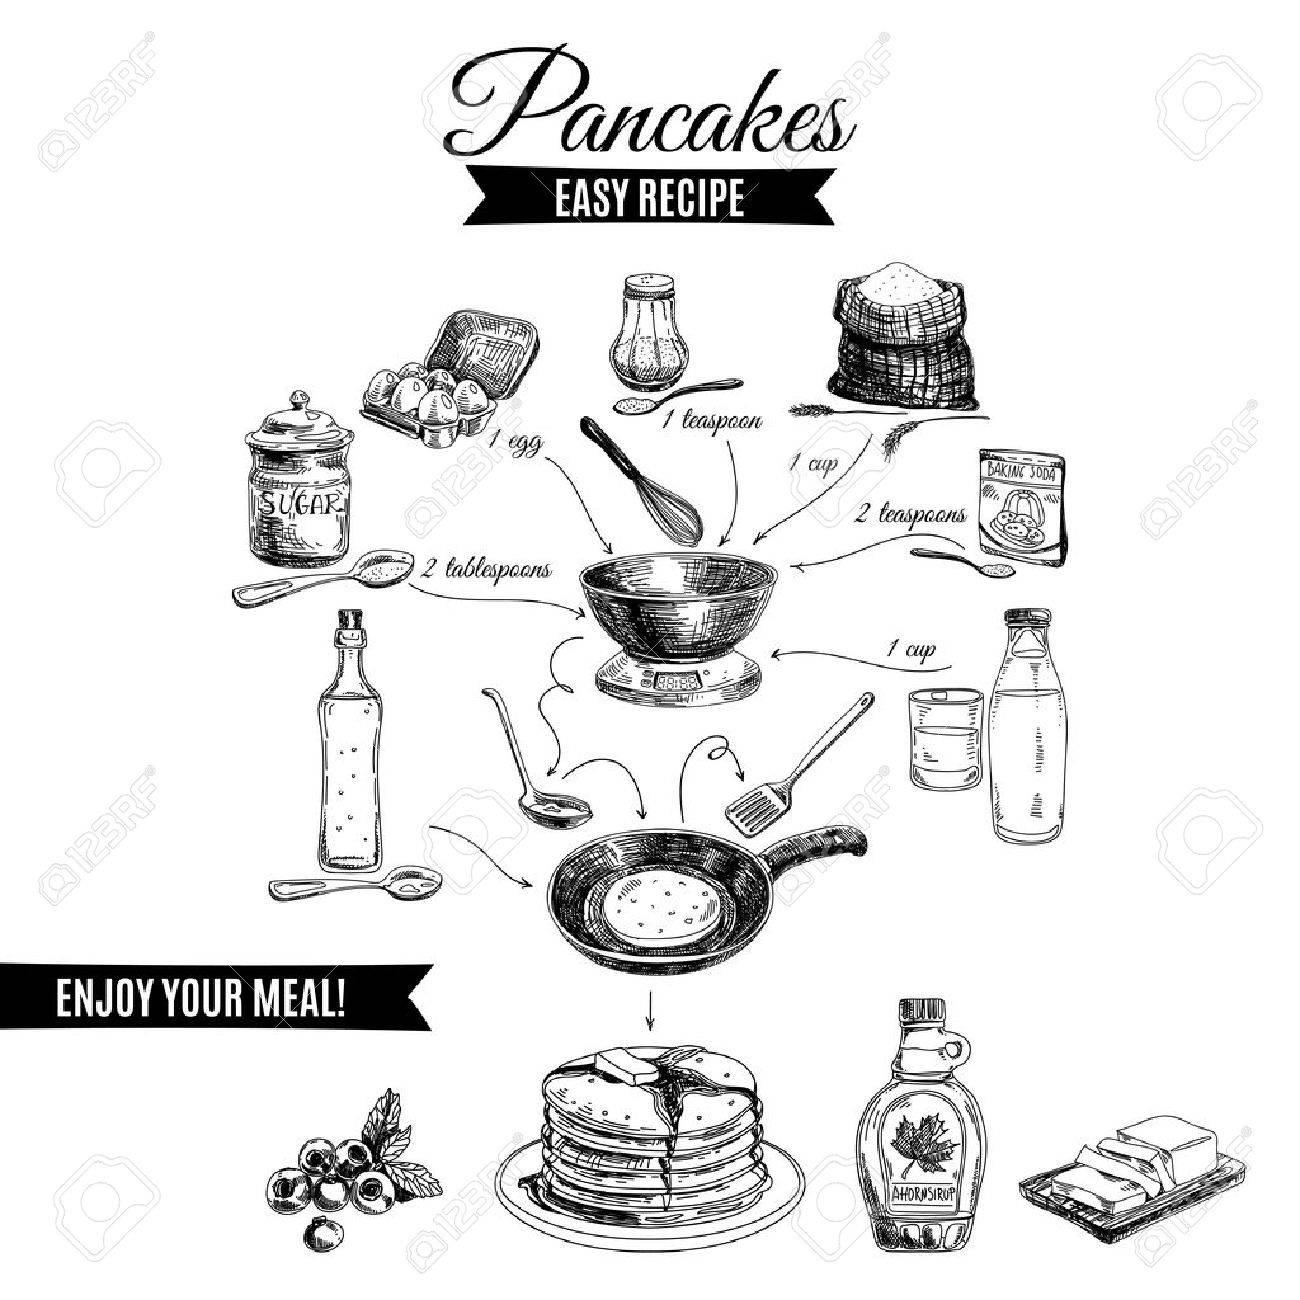 1300x1300 Vector Hand Drawn Pancakes Illustration. Vintage Set With Milk